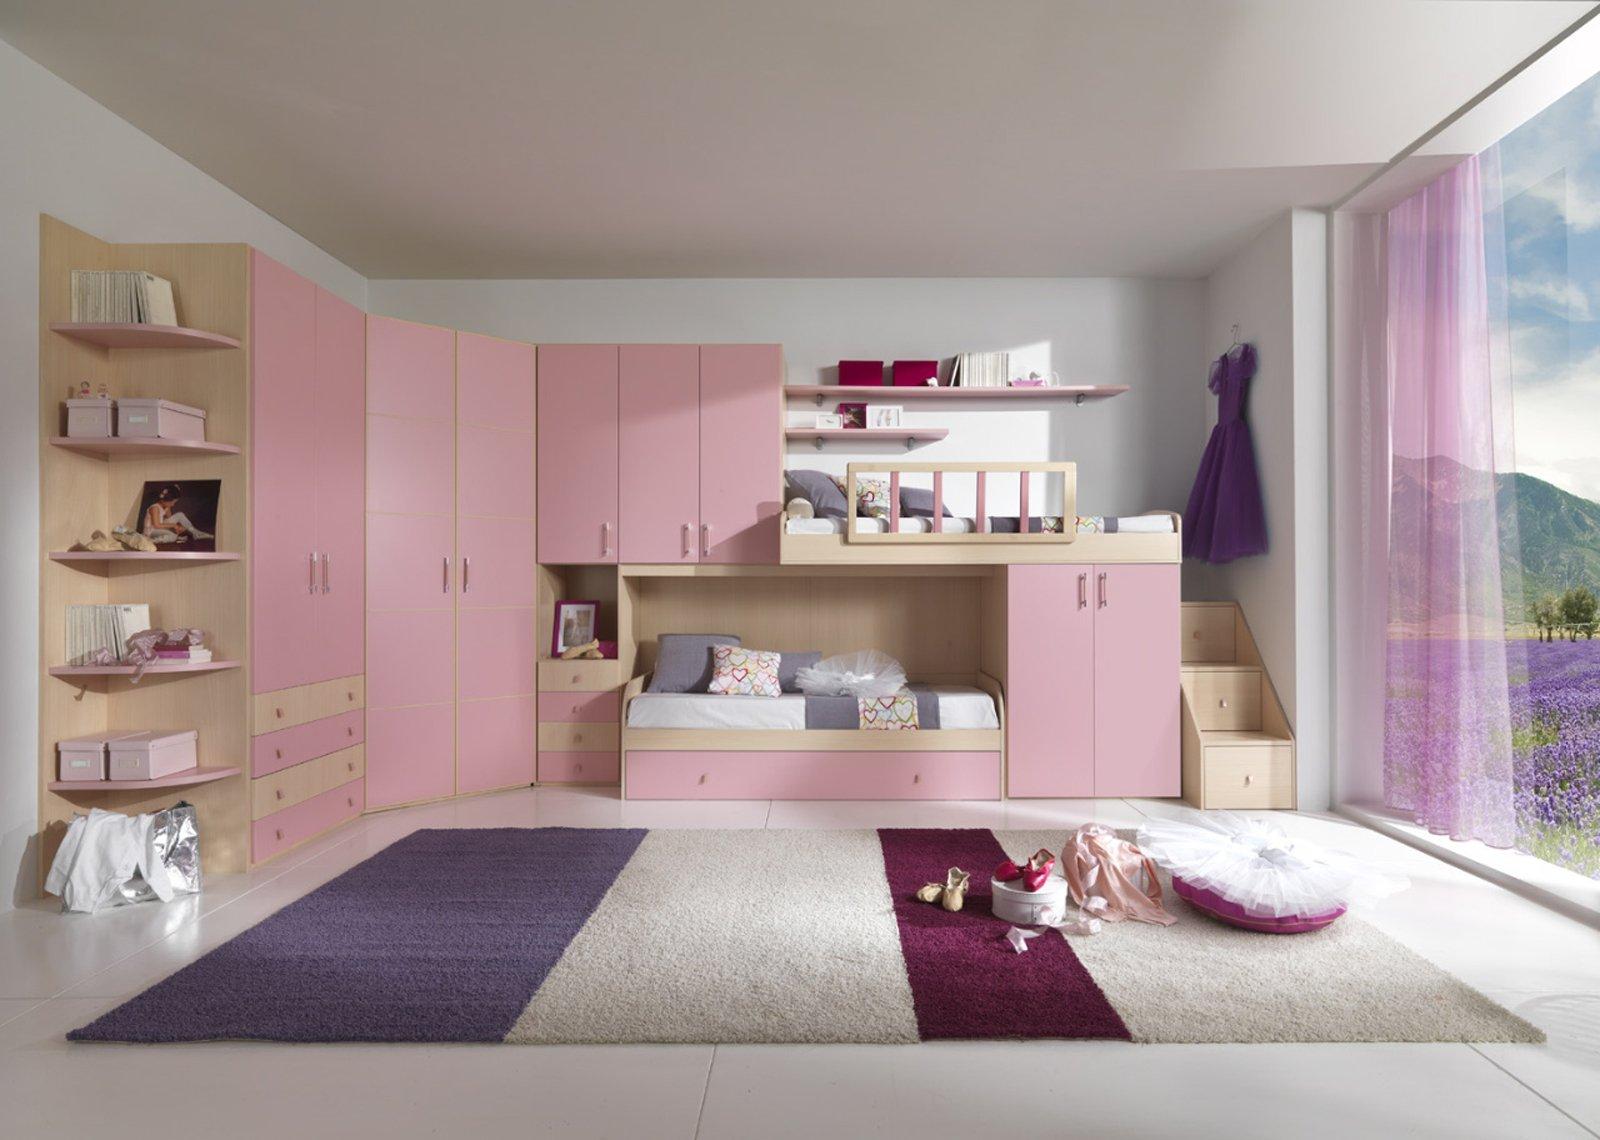 camerette funzionalit a misura di bambino cose di casa